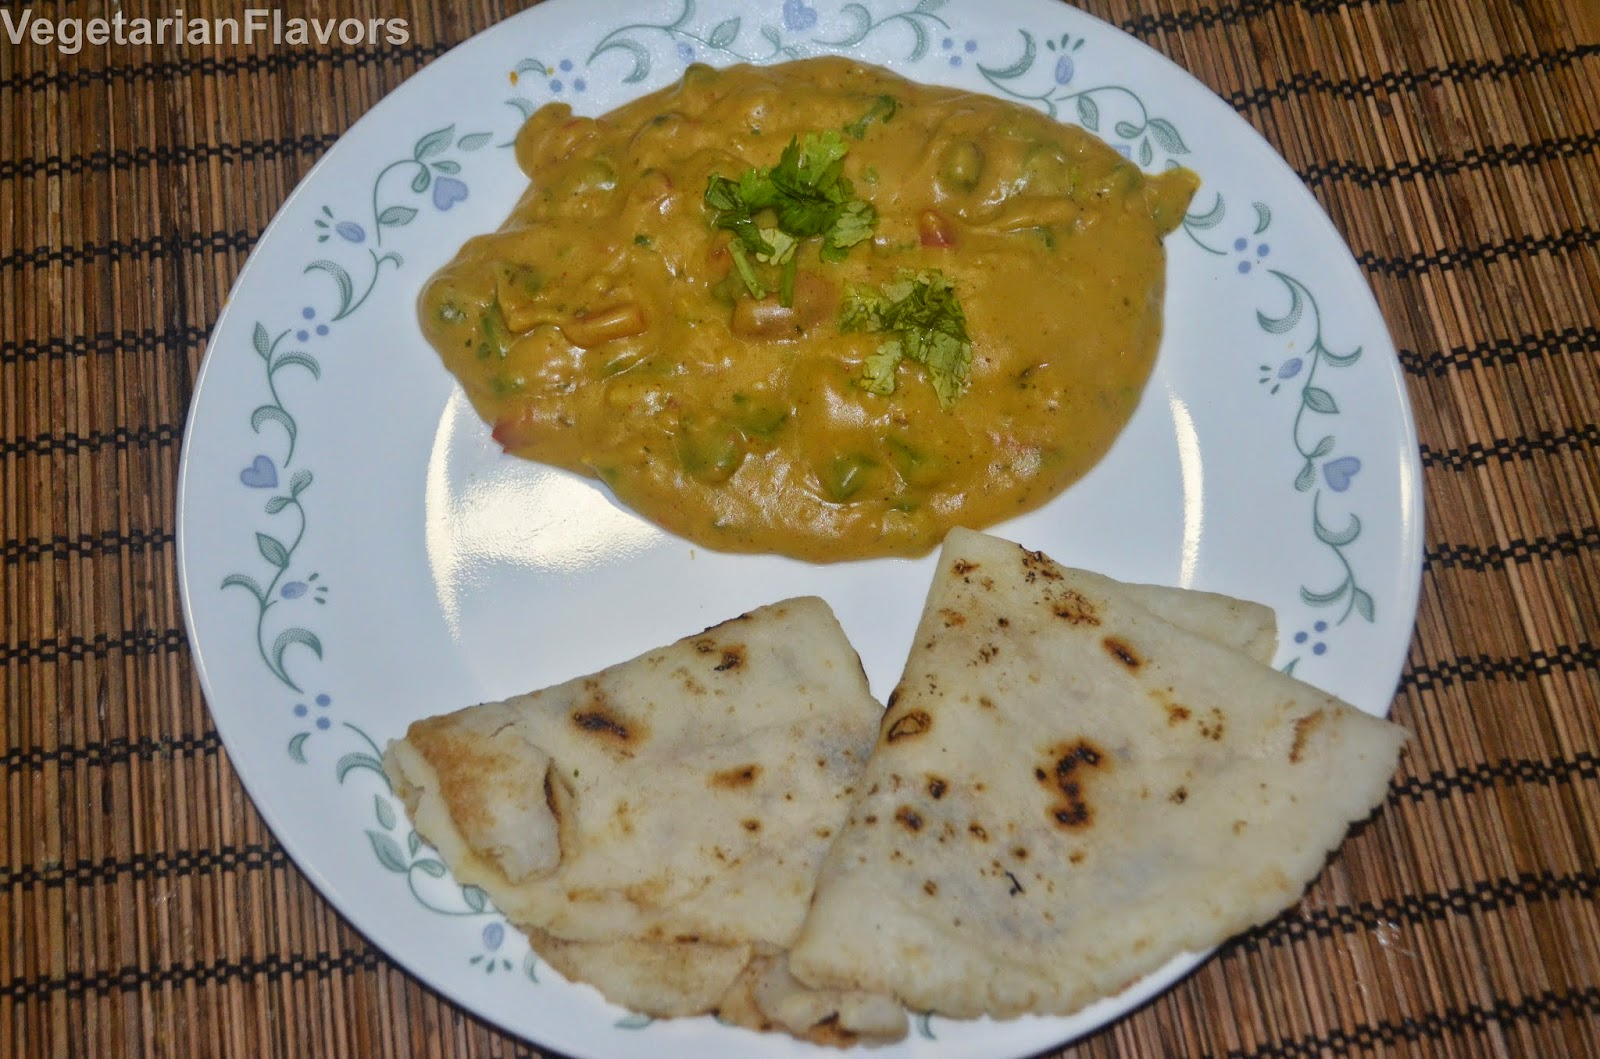 VegetarianFlavorsJunka/Pitla- Bell pepper Chickpea curry